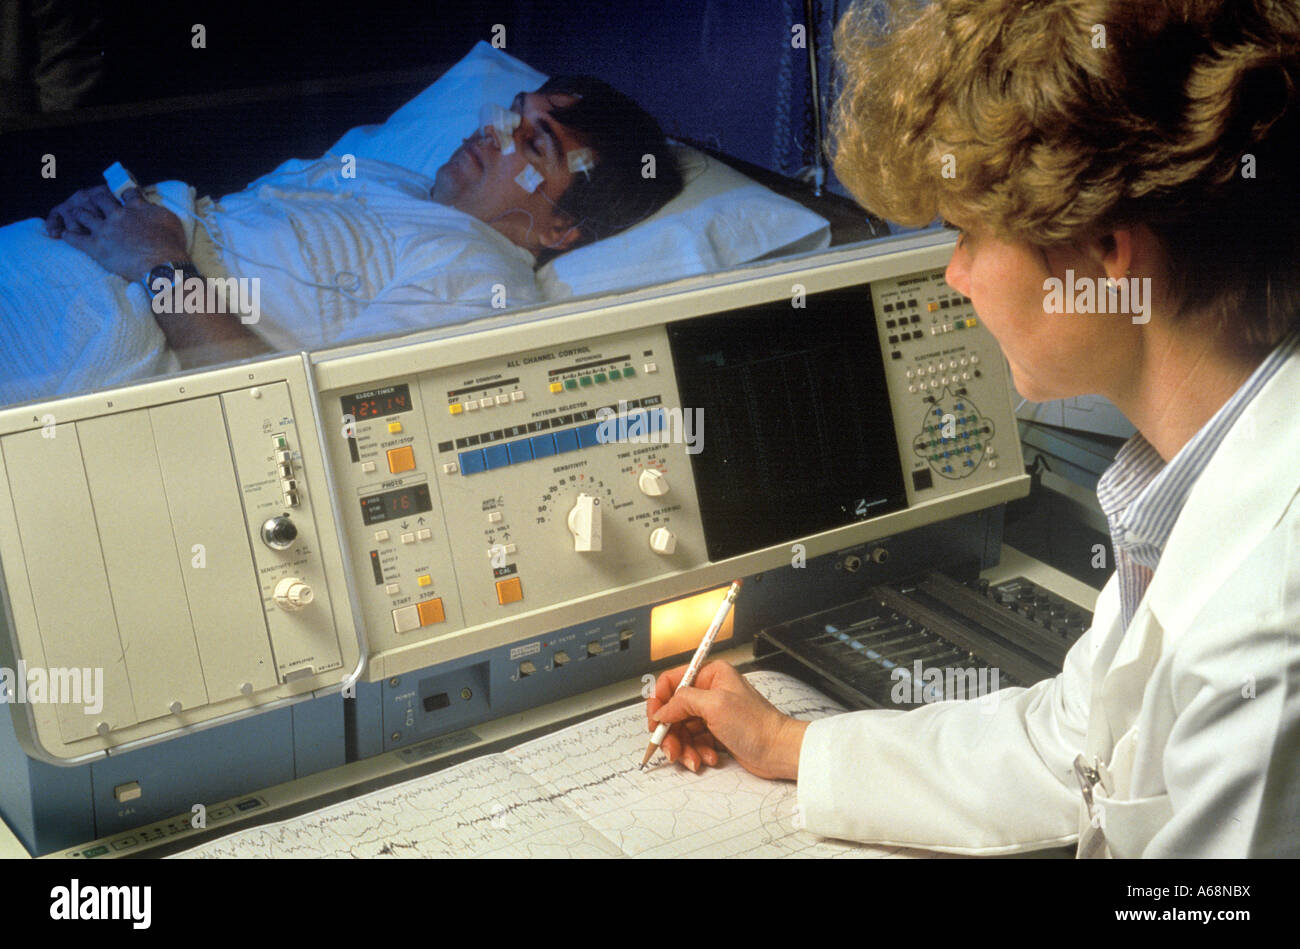 Sleep disorder lab - Stock Image